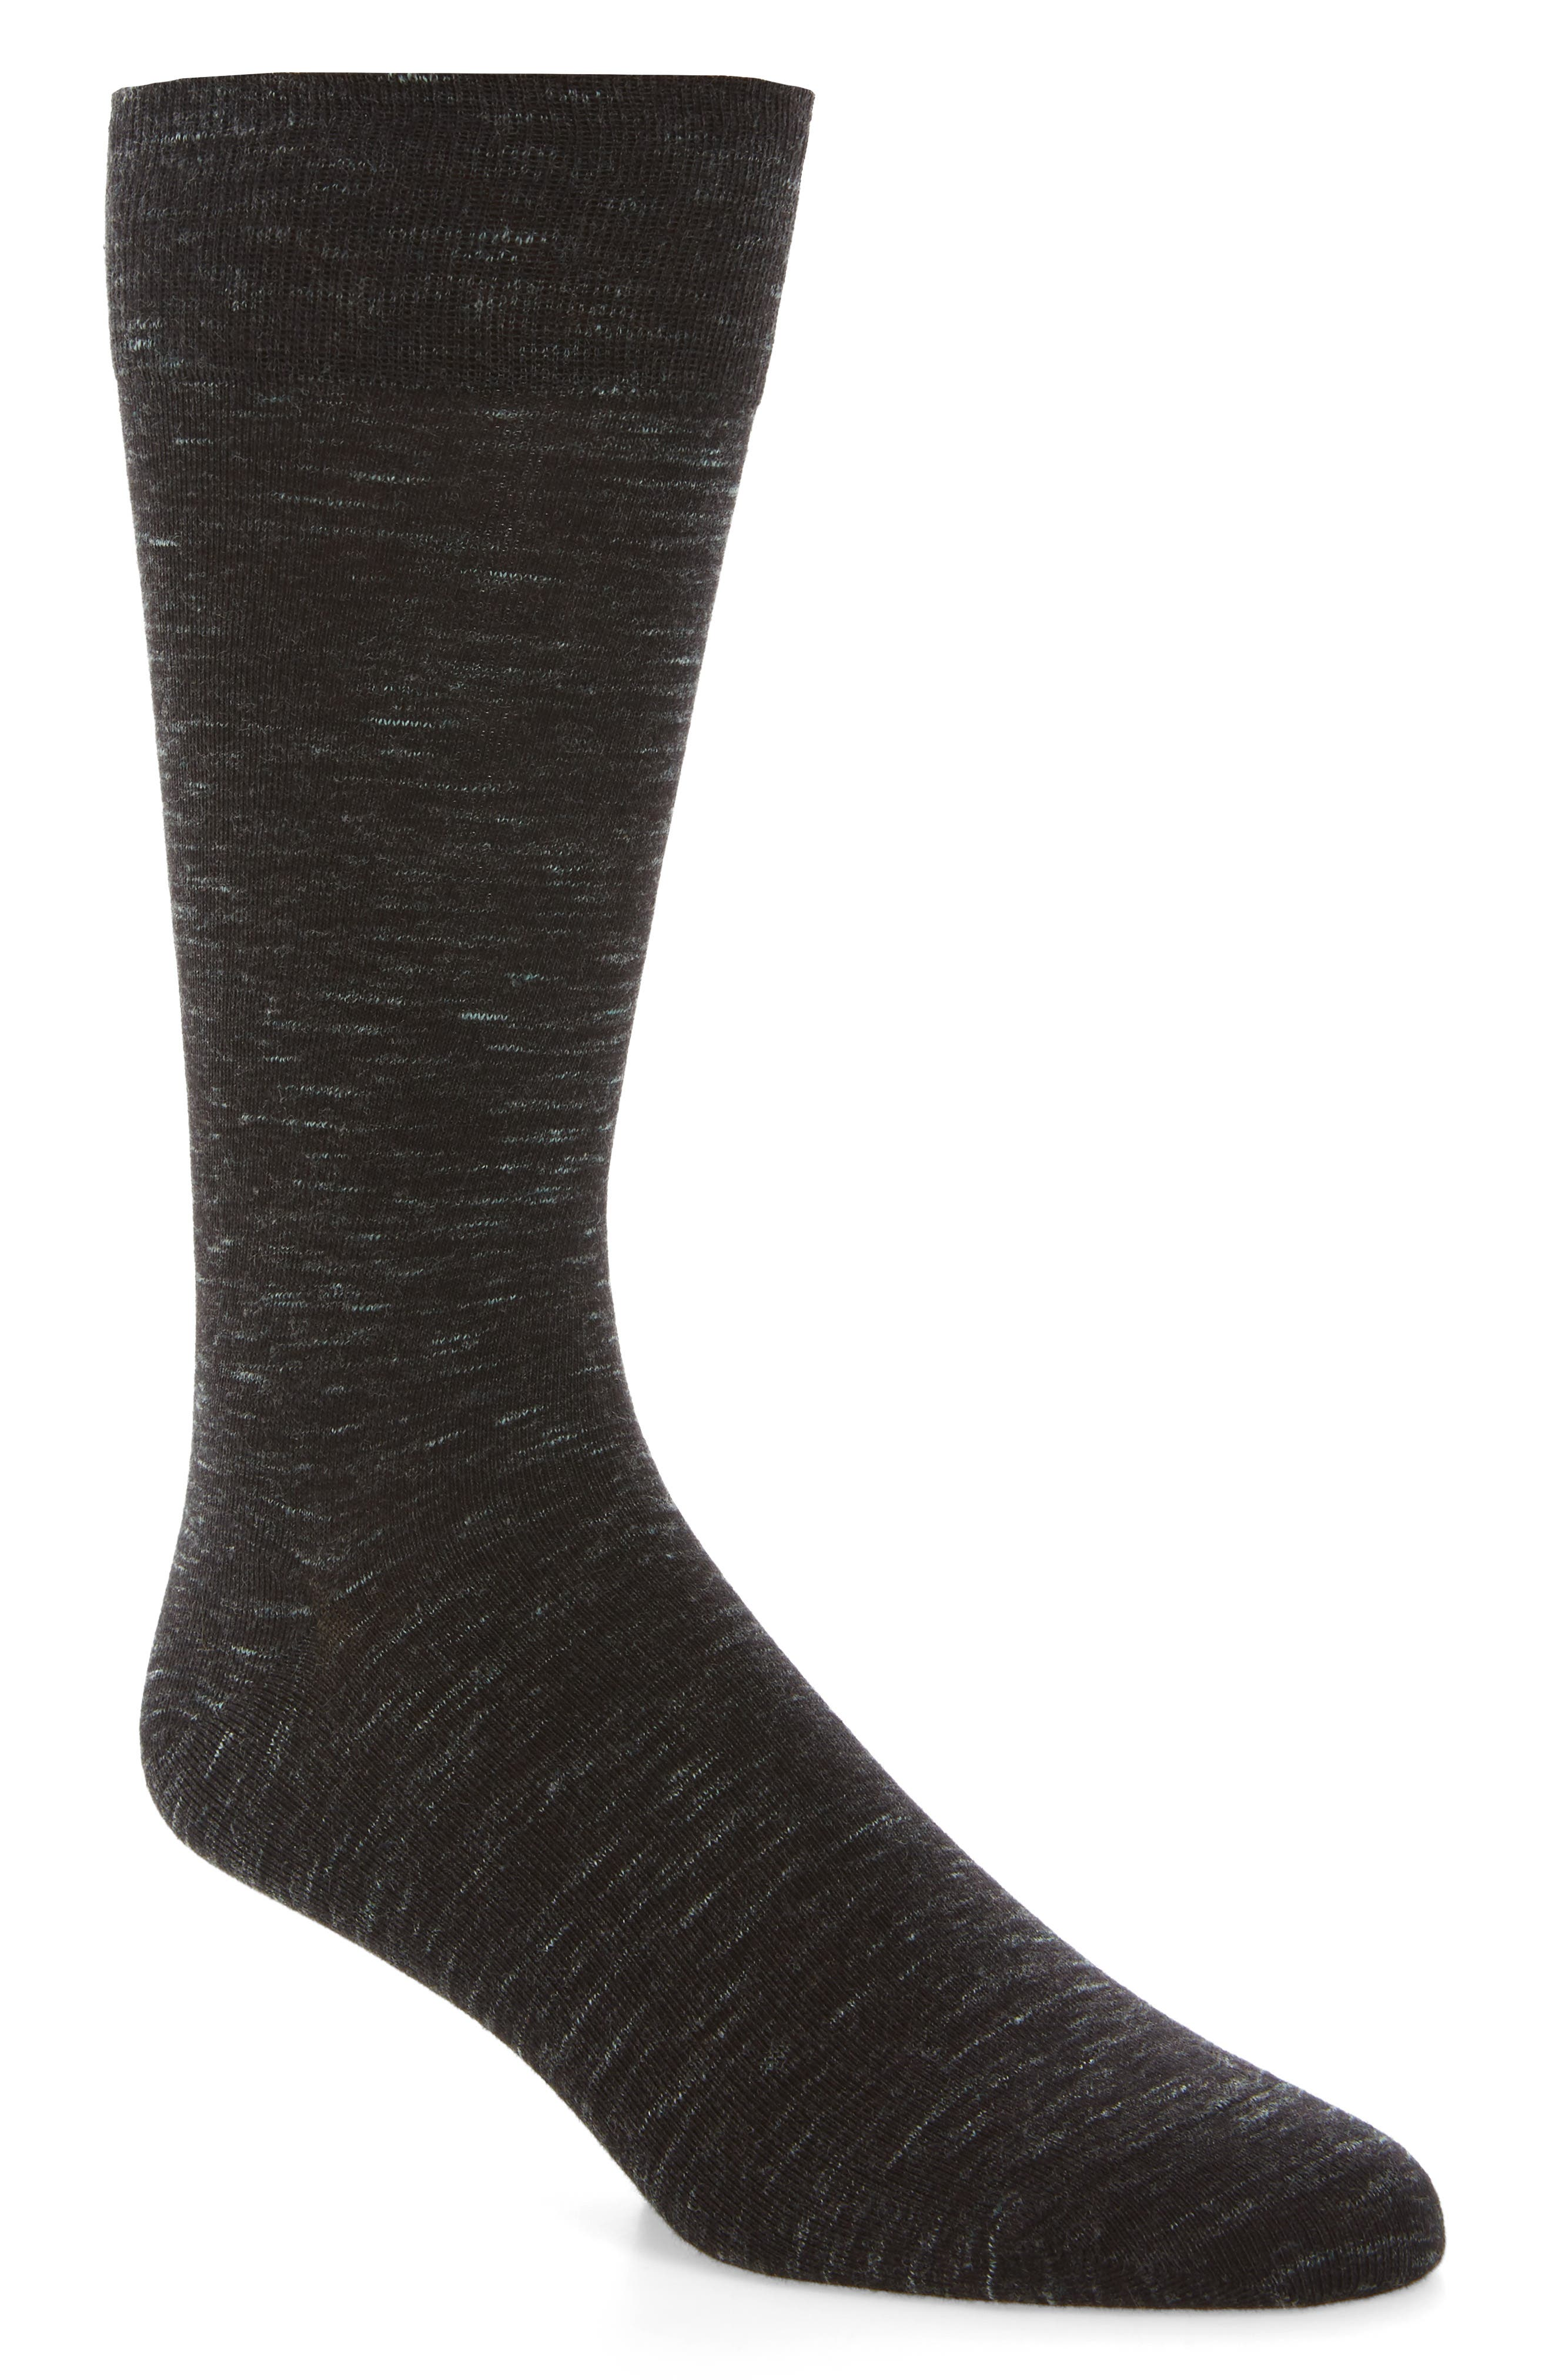 Twist Socks,                         Main,                         color, Black